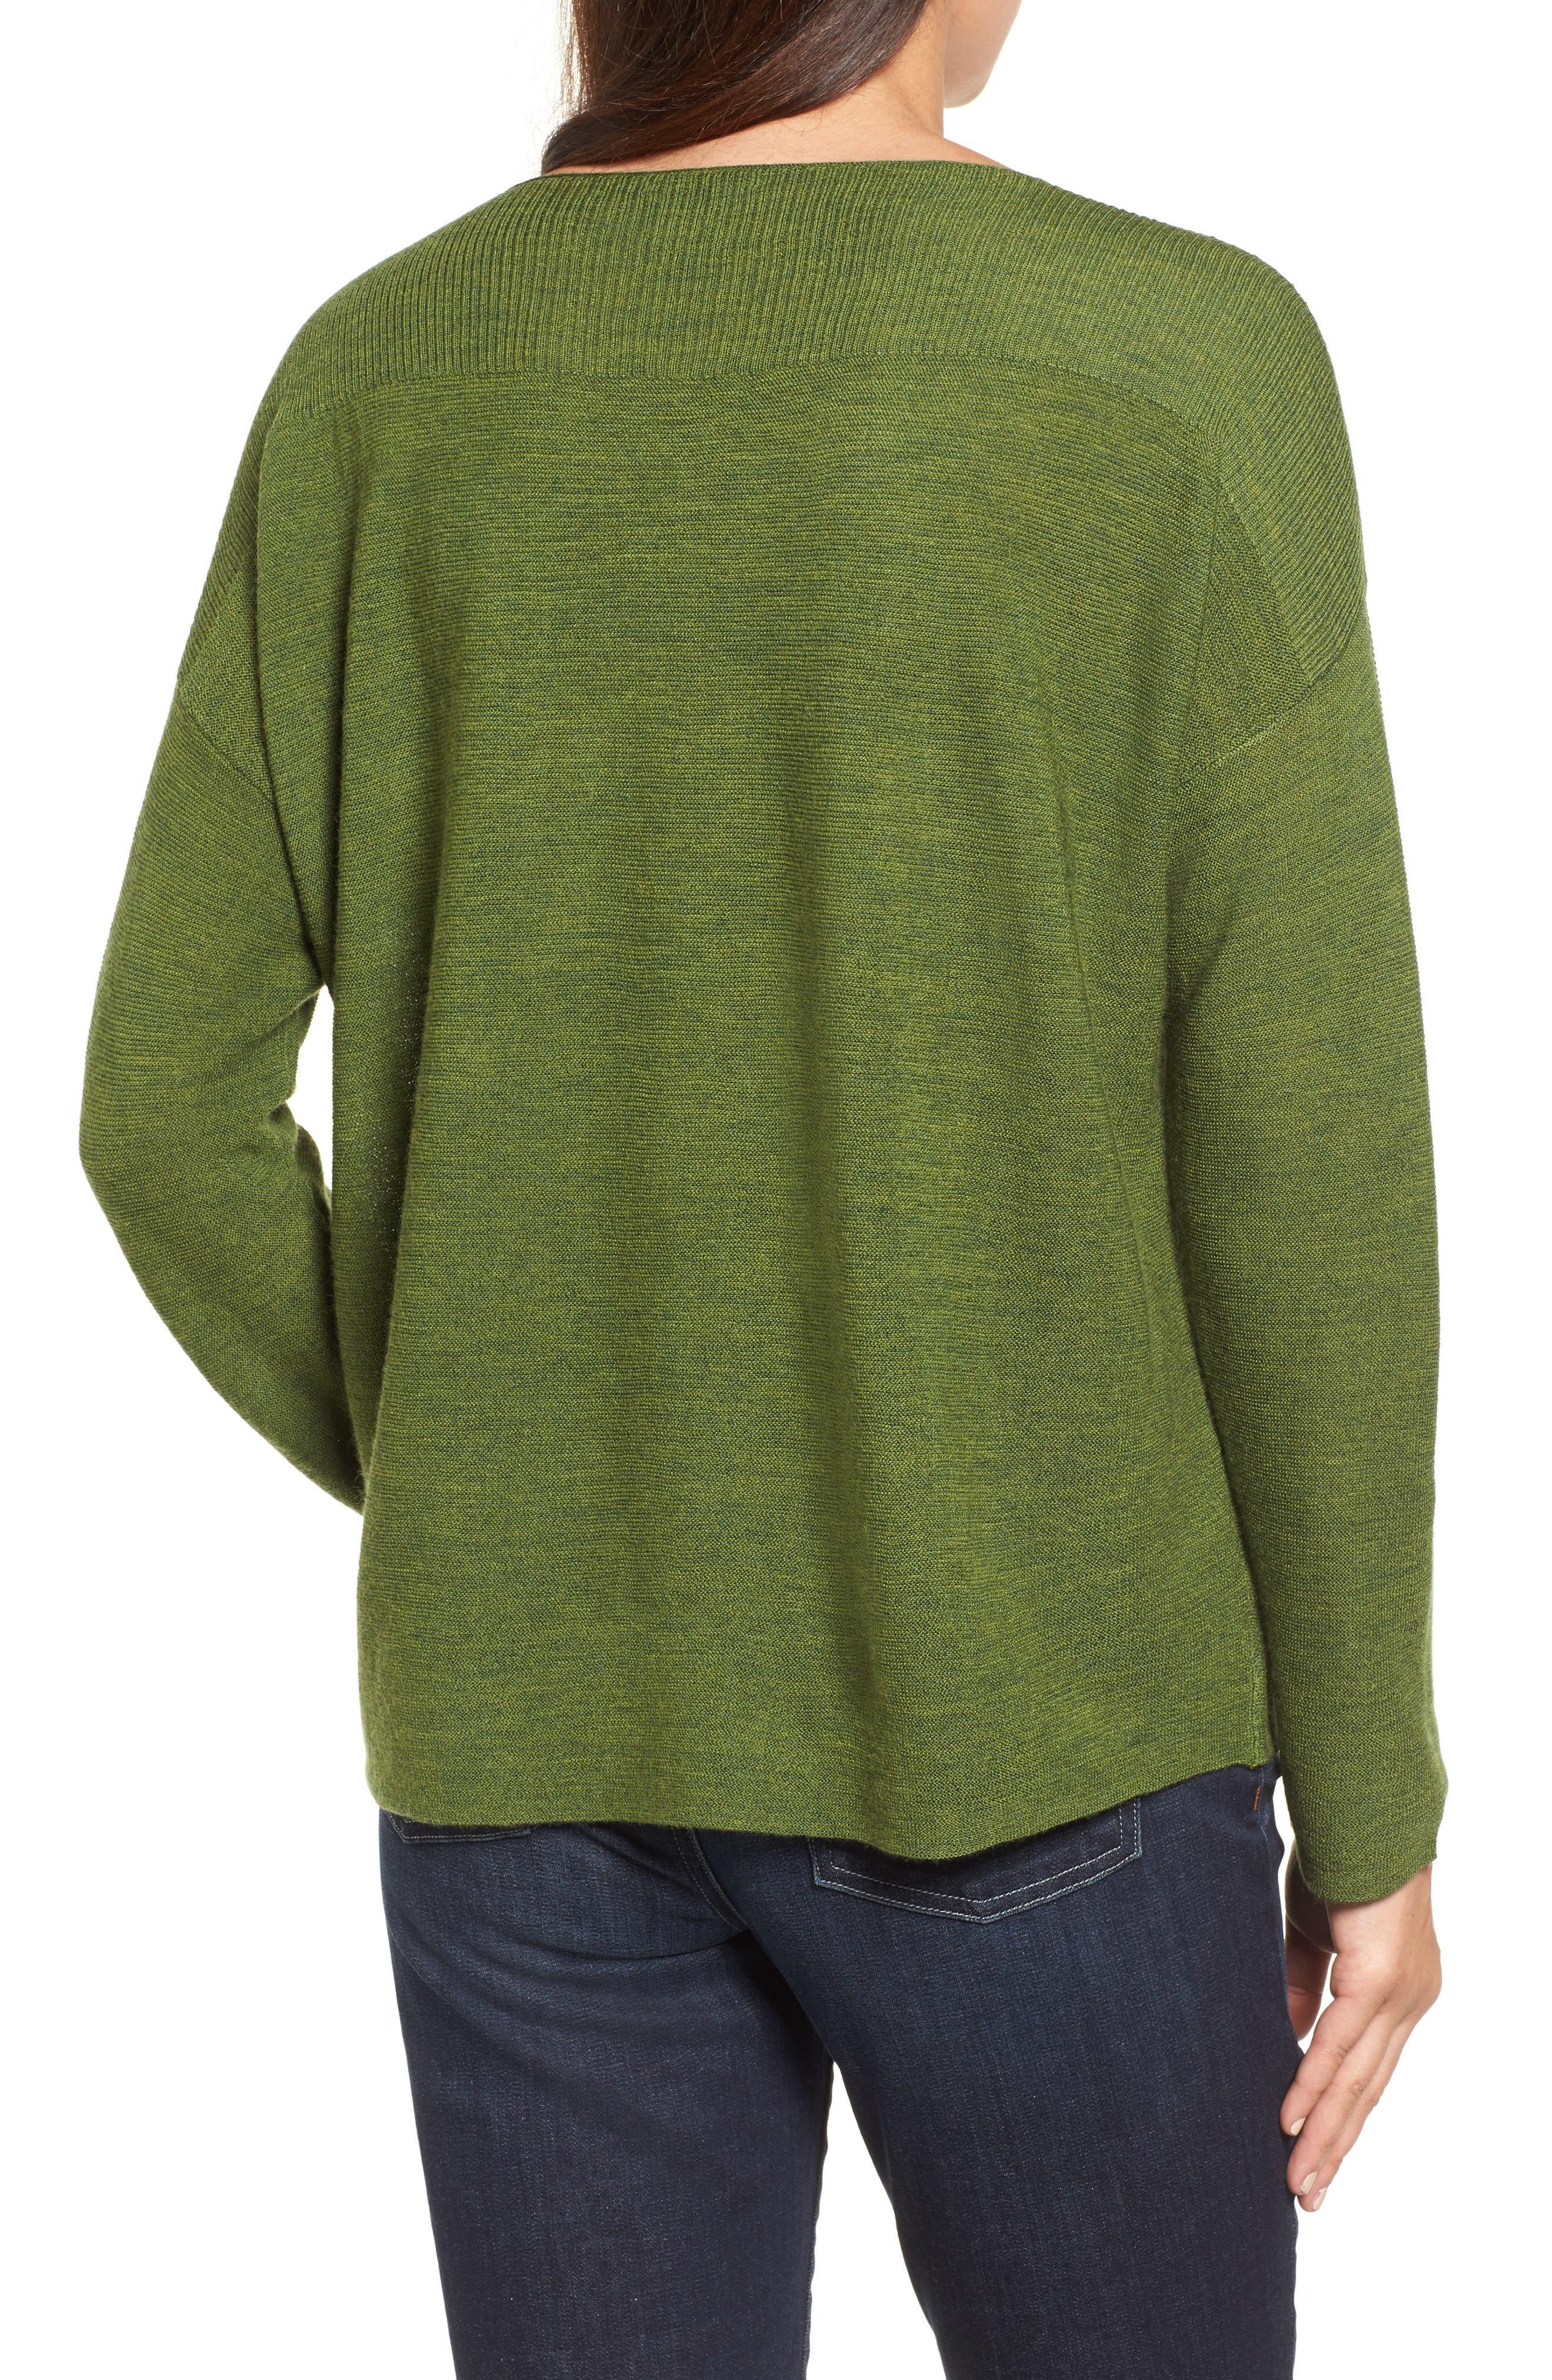 Alternate Image 2  - Eileen Fisher Mix Stitch Merino Bateau Neck Sweater (Regular & Petite)